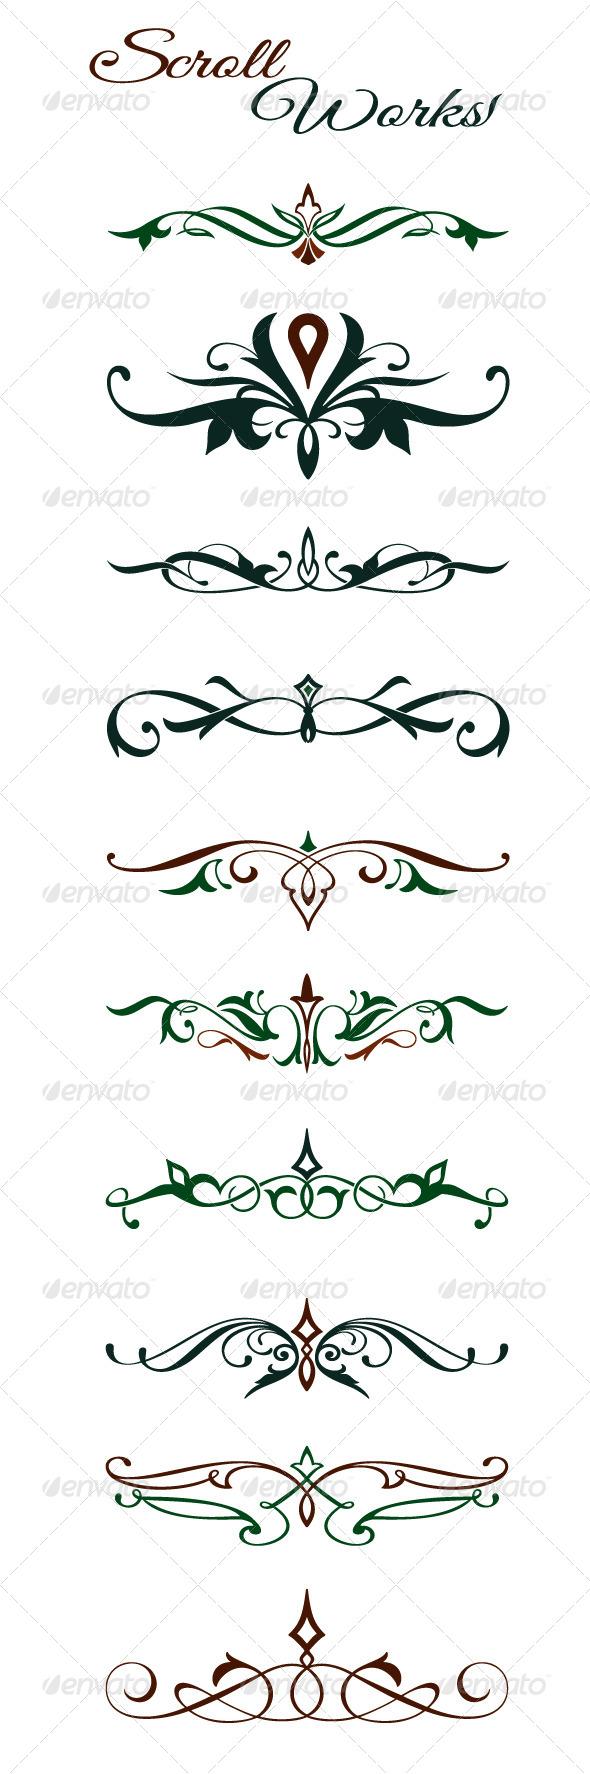 GraphicRiver Scroll Design Elements 6173685